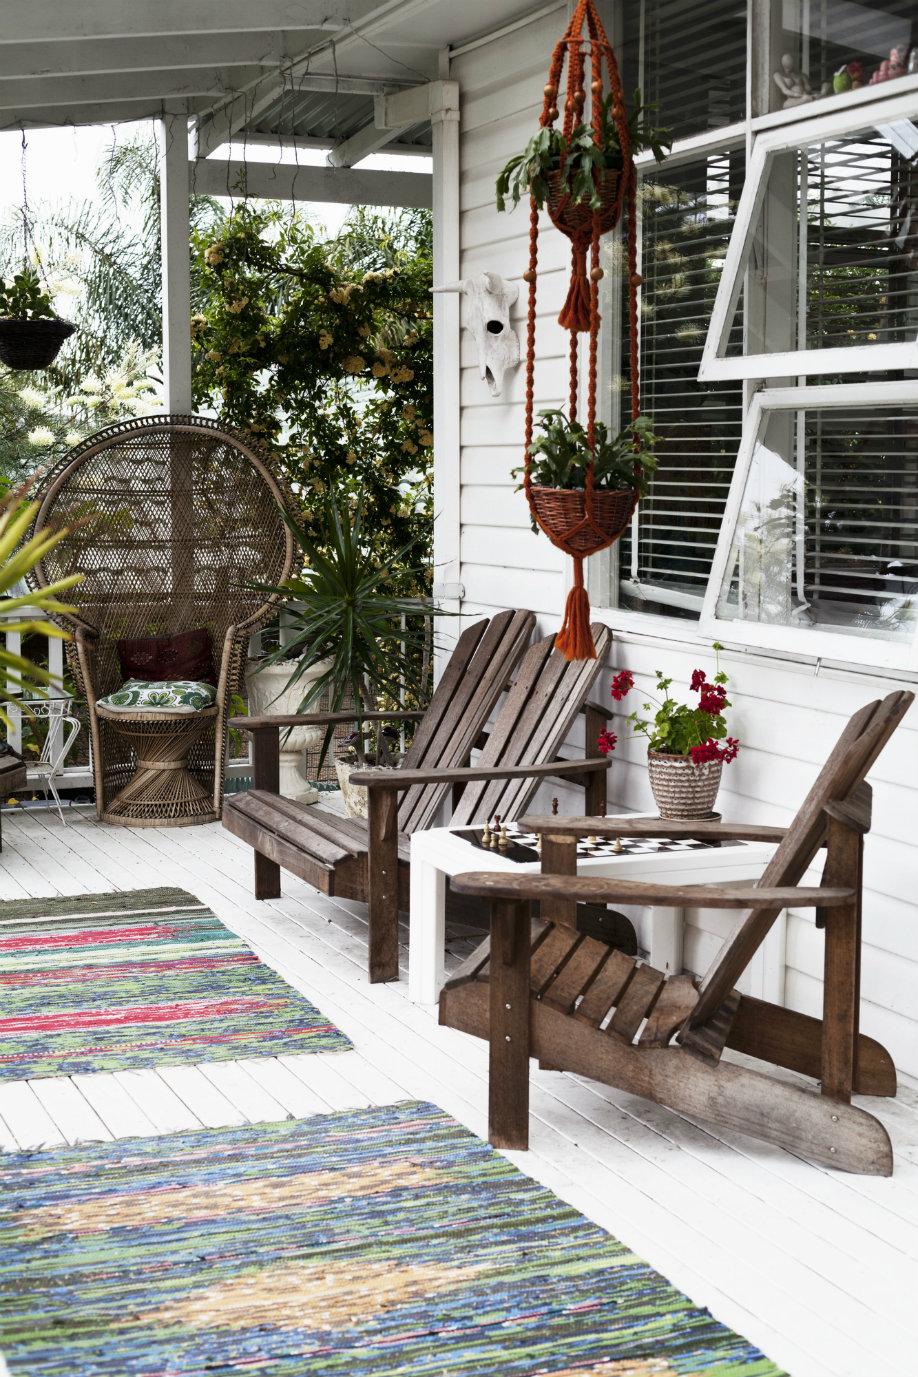 westwing-boho-stil-terrasse